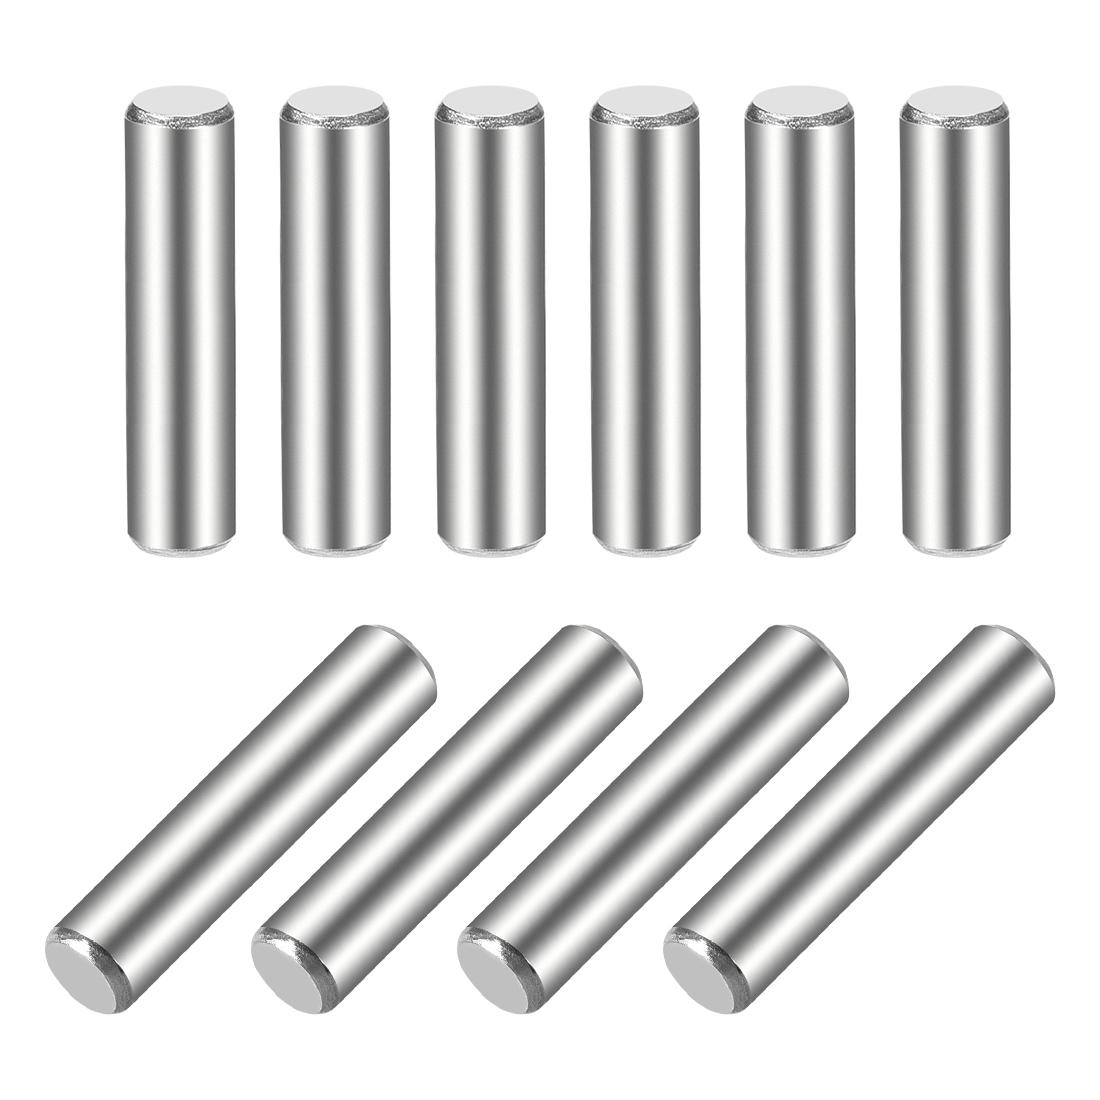 10Pcs 5mm x 25mm Dowel Pin 304 Stainless Steel Shelf Support Pin Fasten